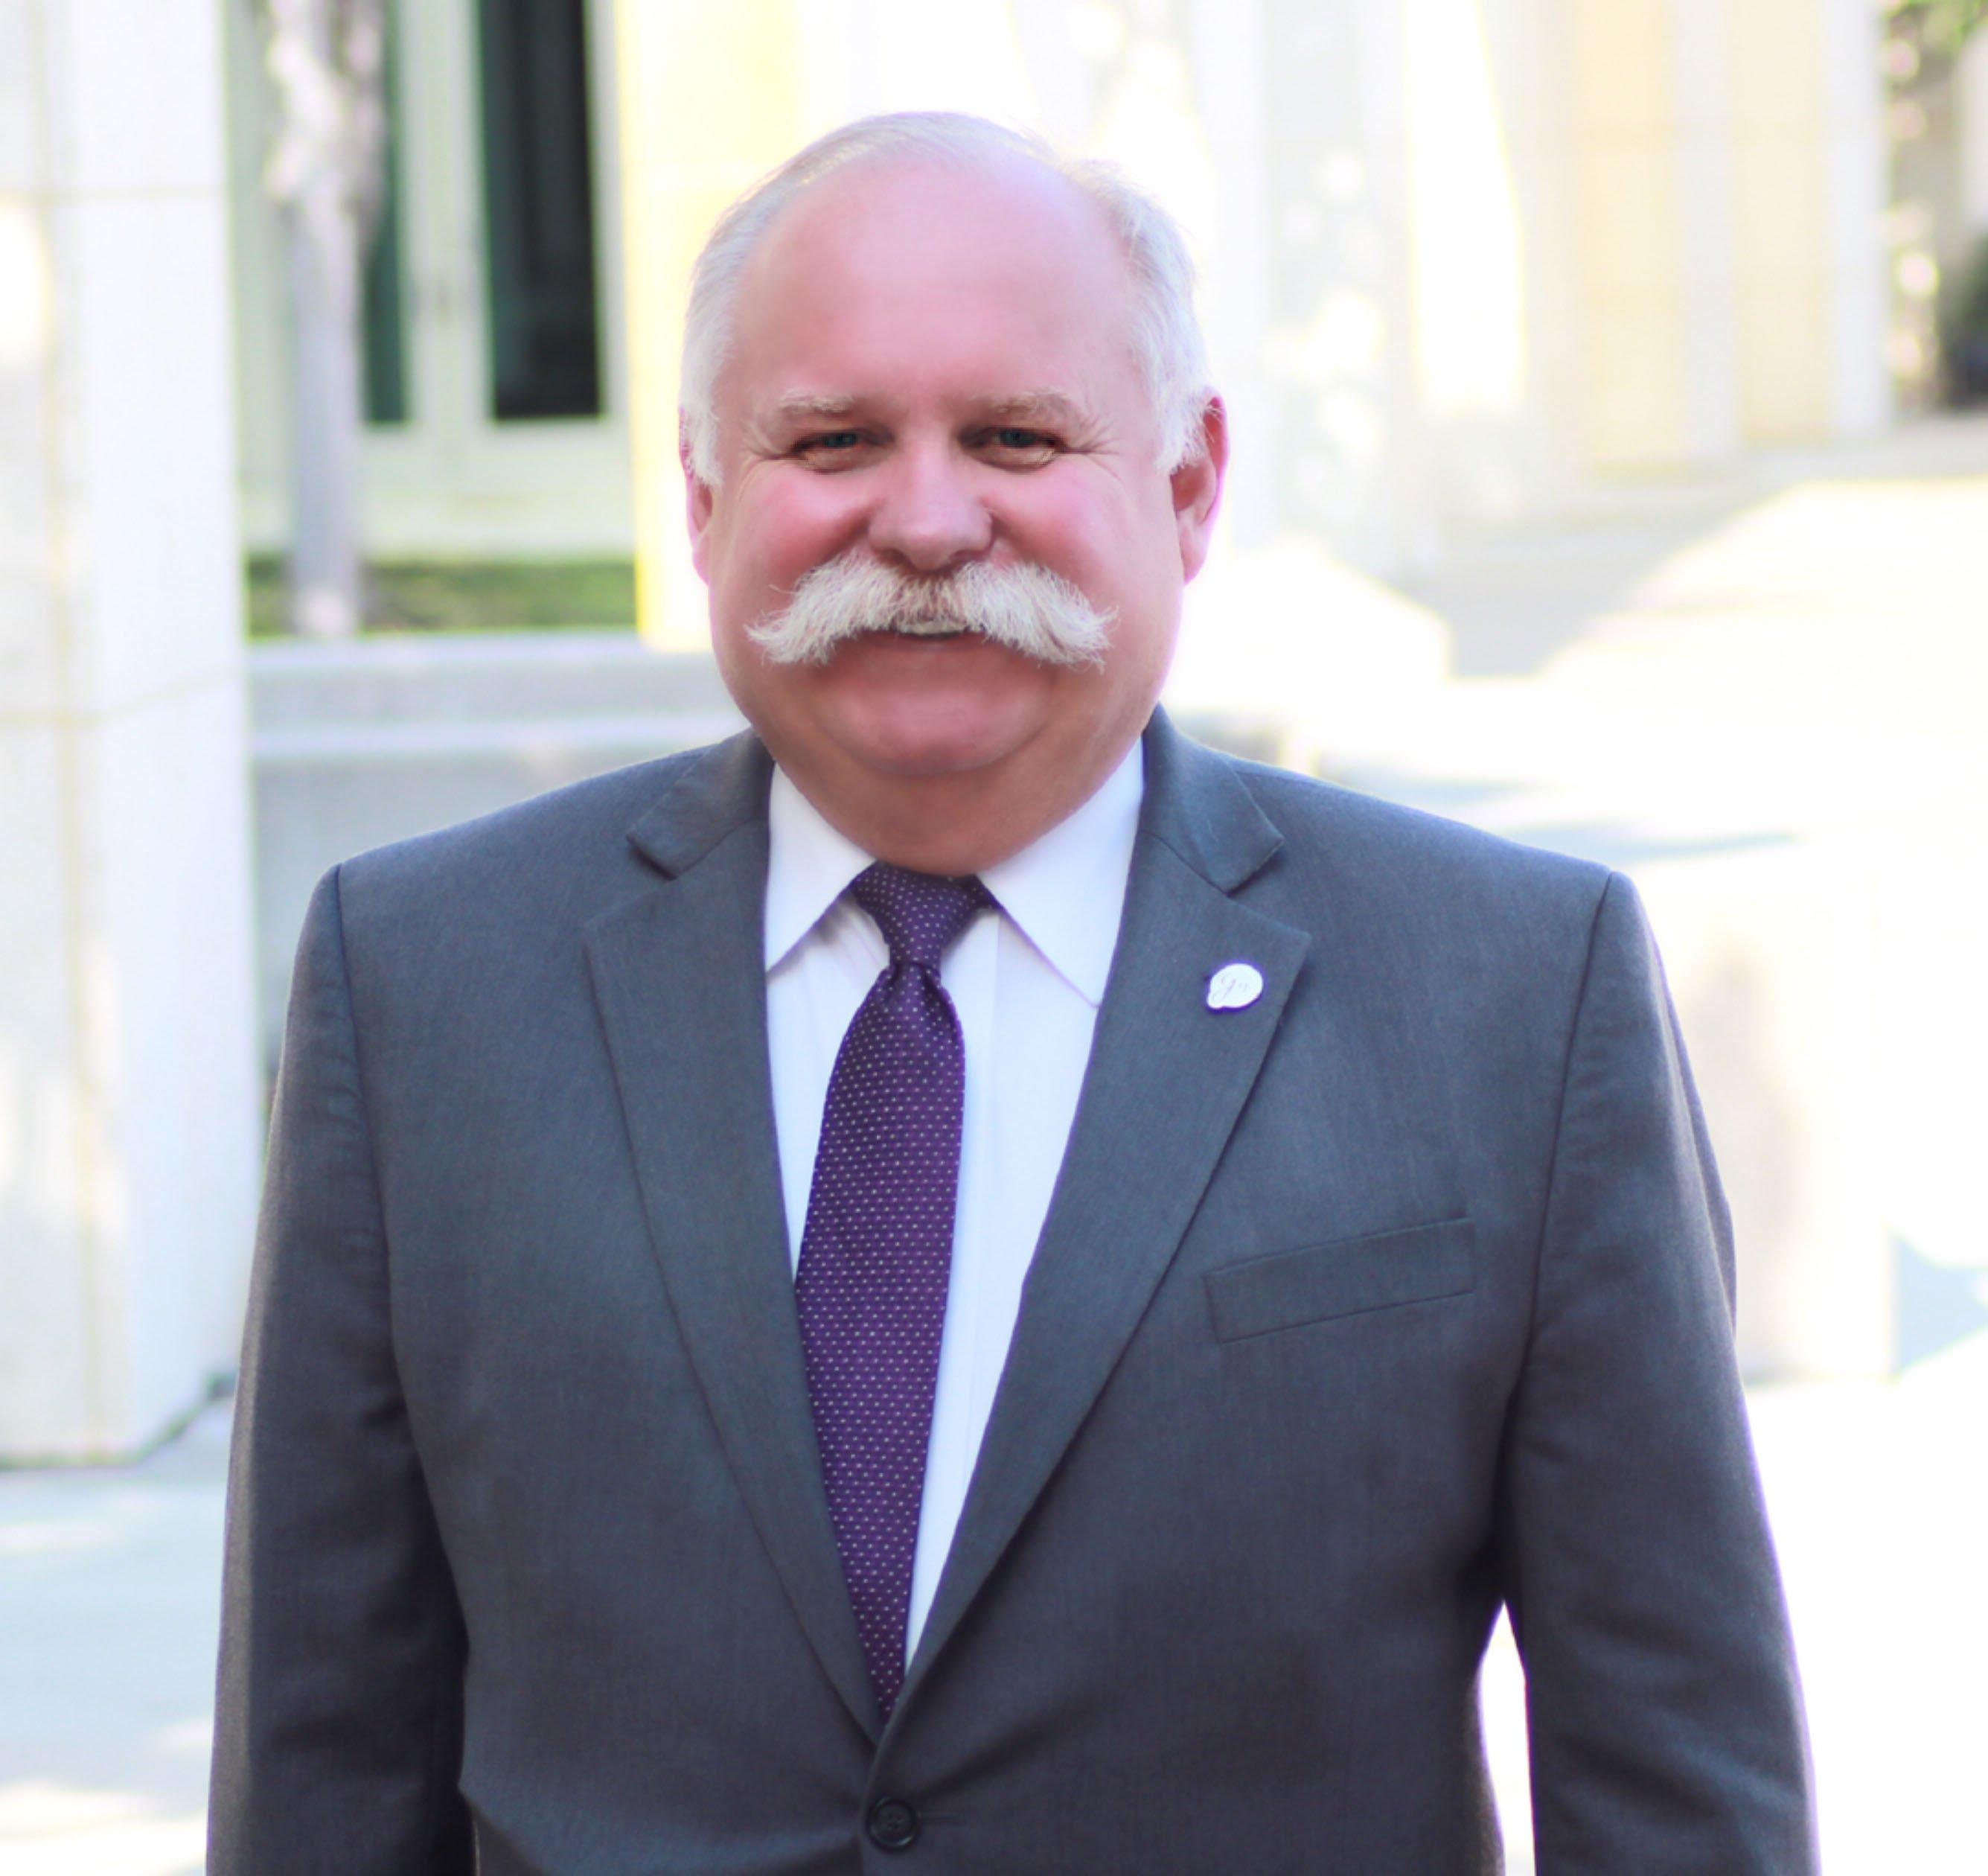 Duane-mcpherson-president-grandmanors